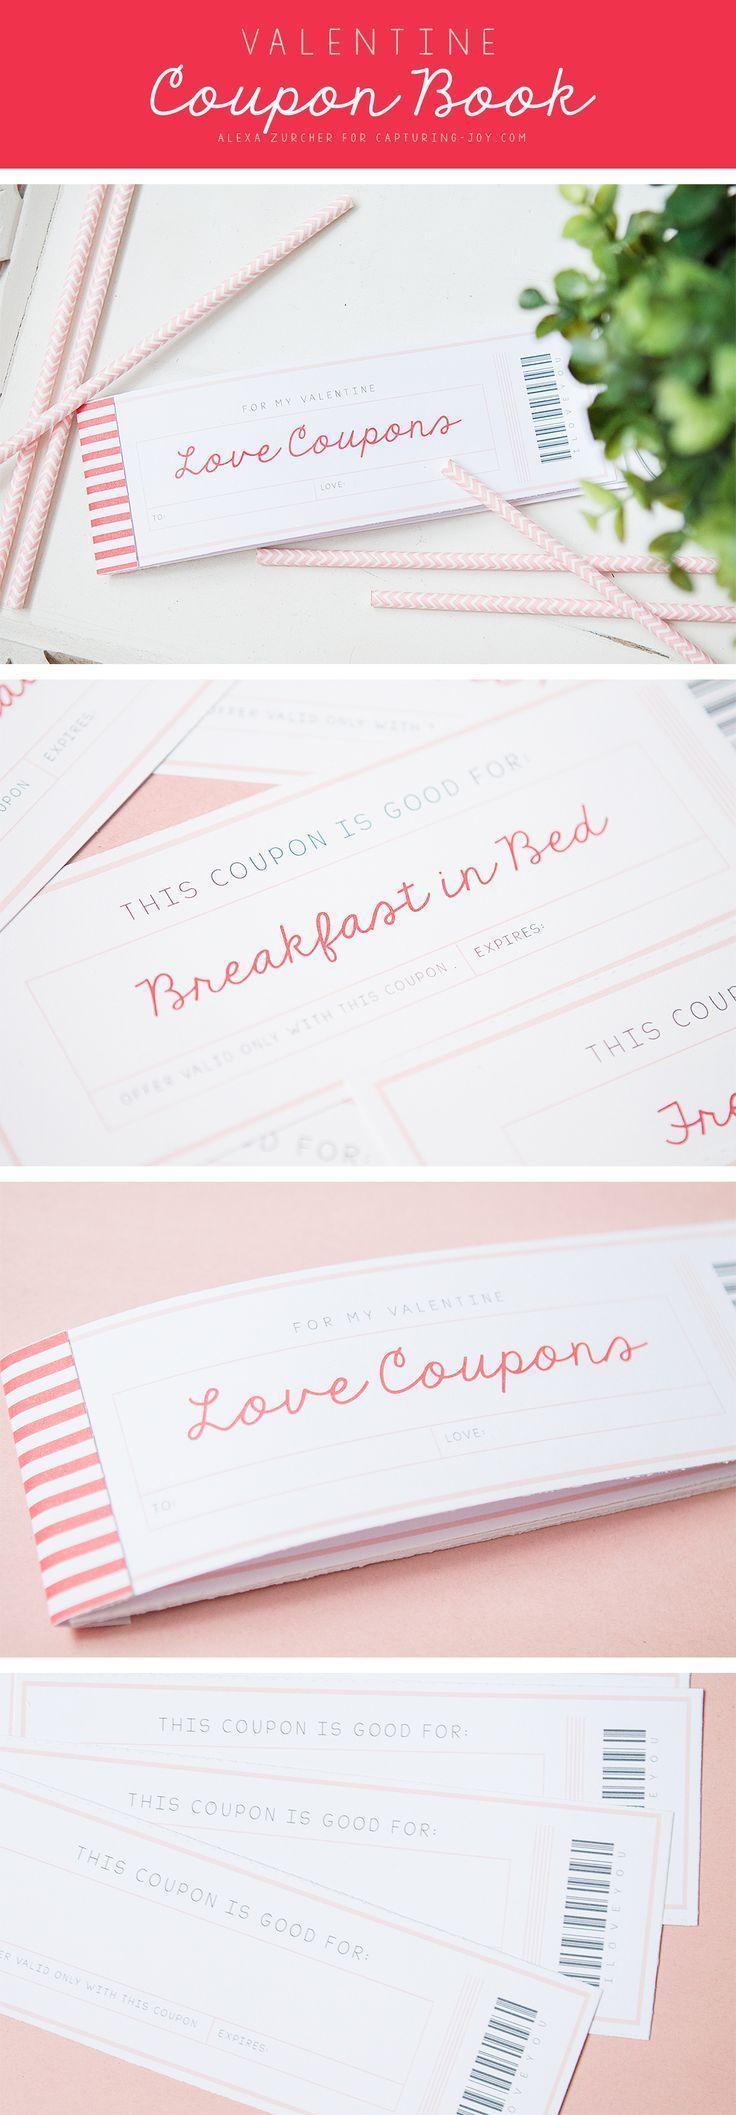 Valentine's Day Coupon Book!  Free printable! http://Capturing-Joy.com